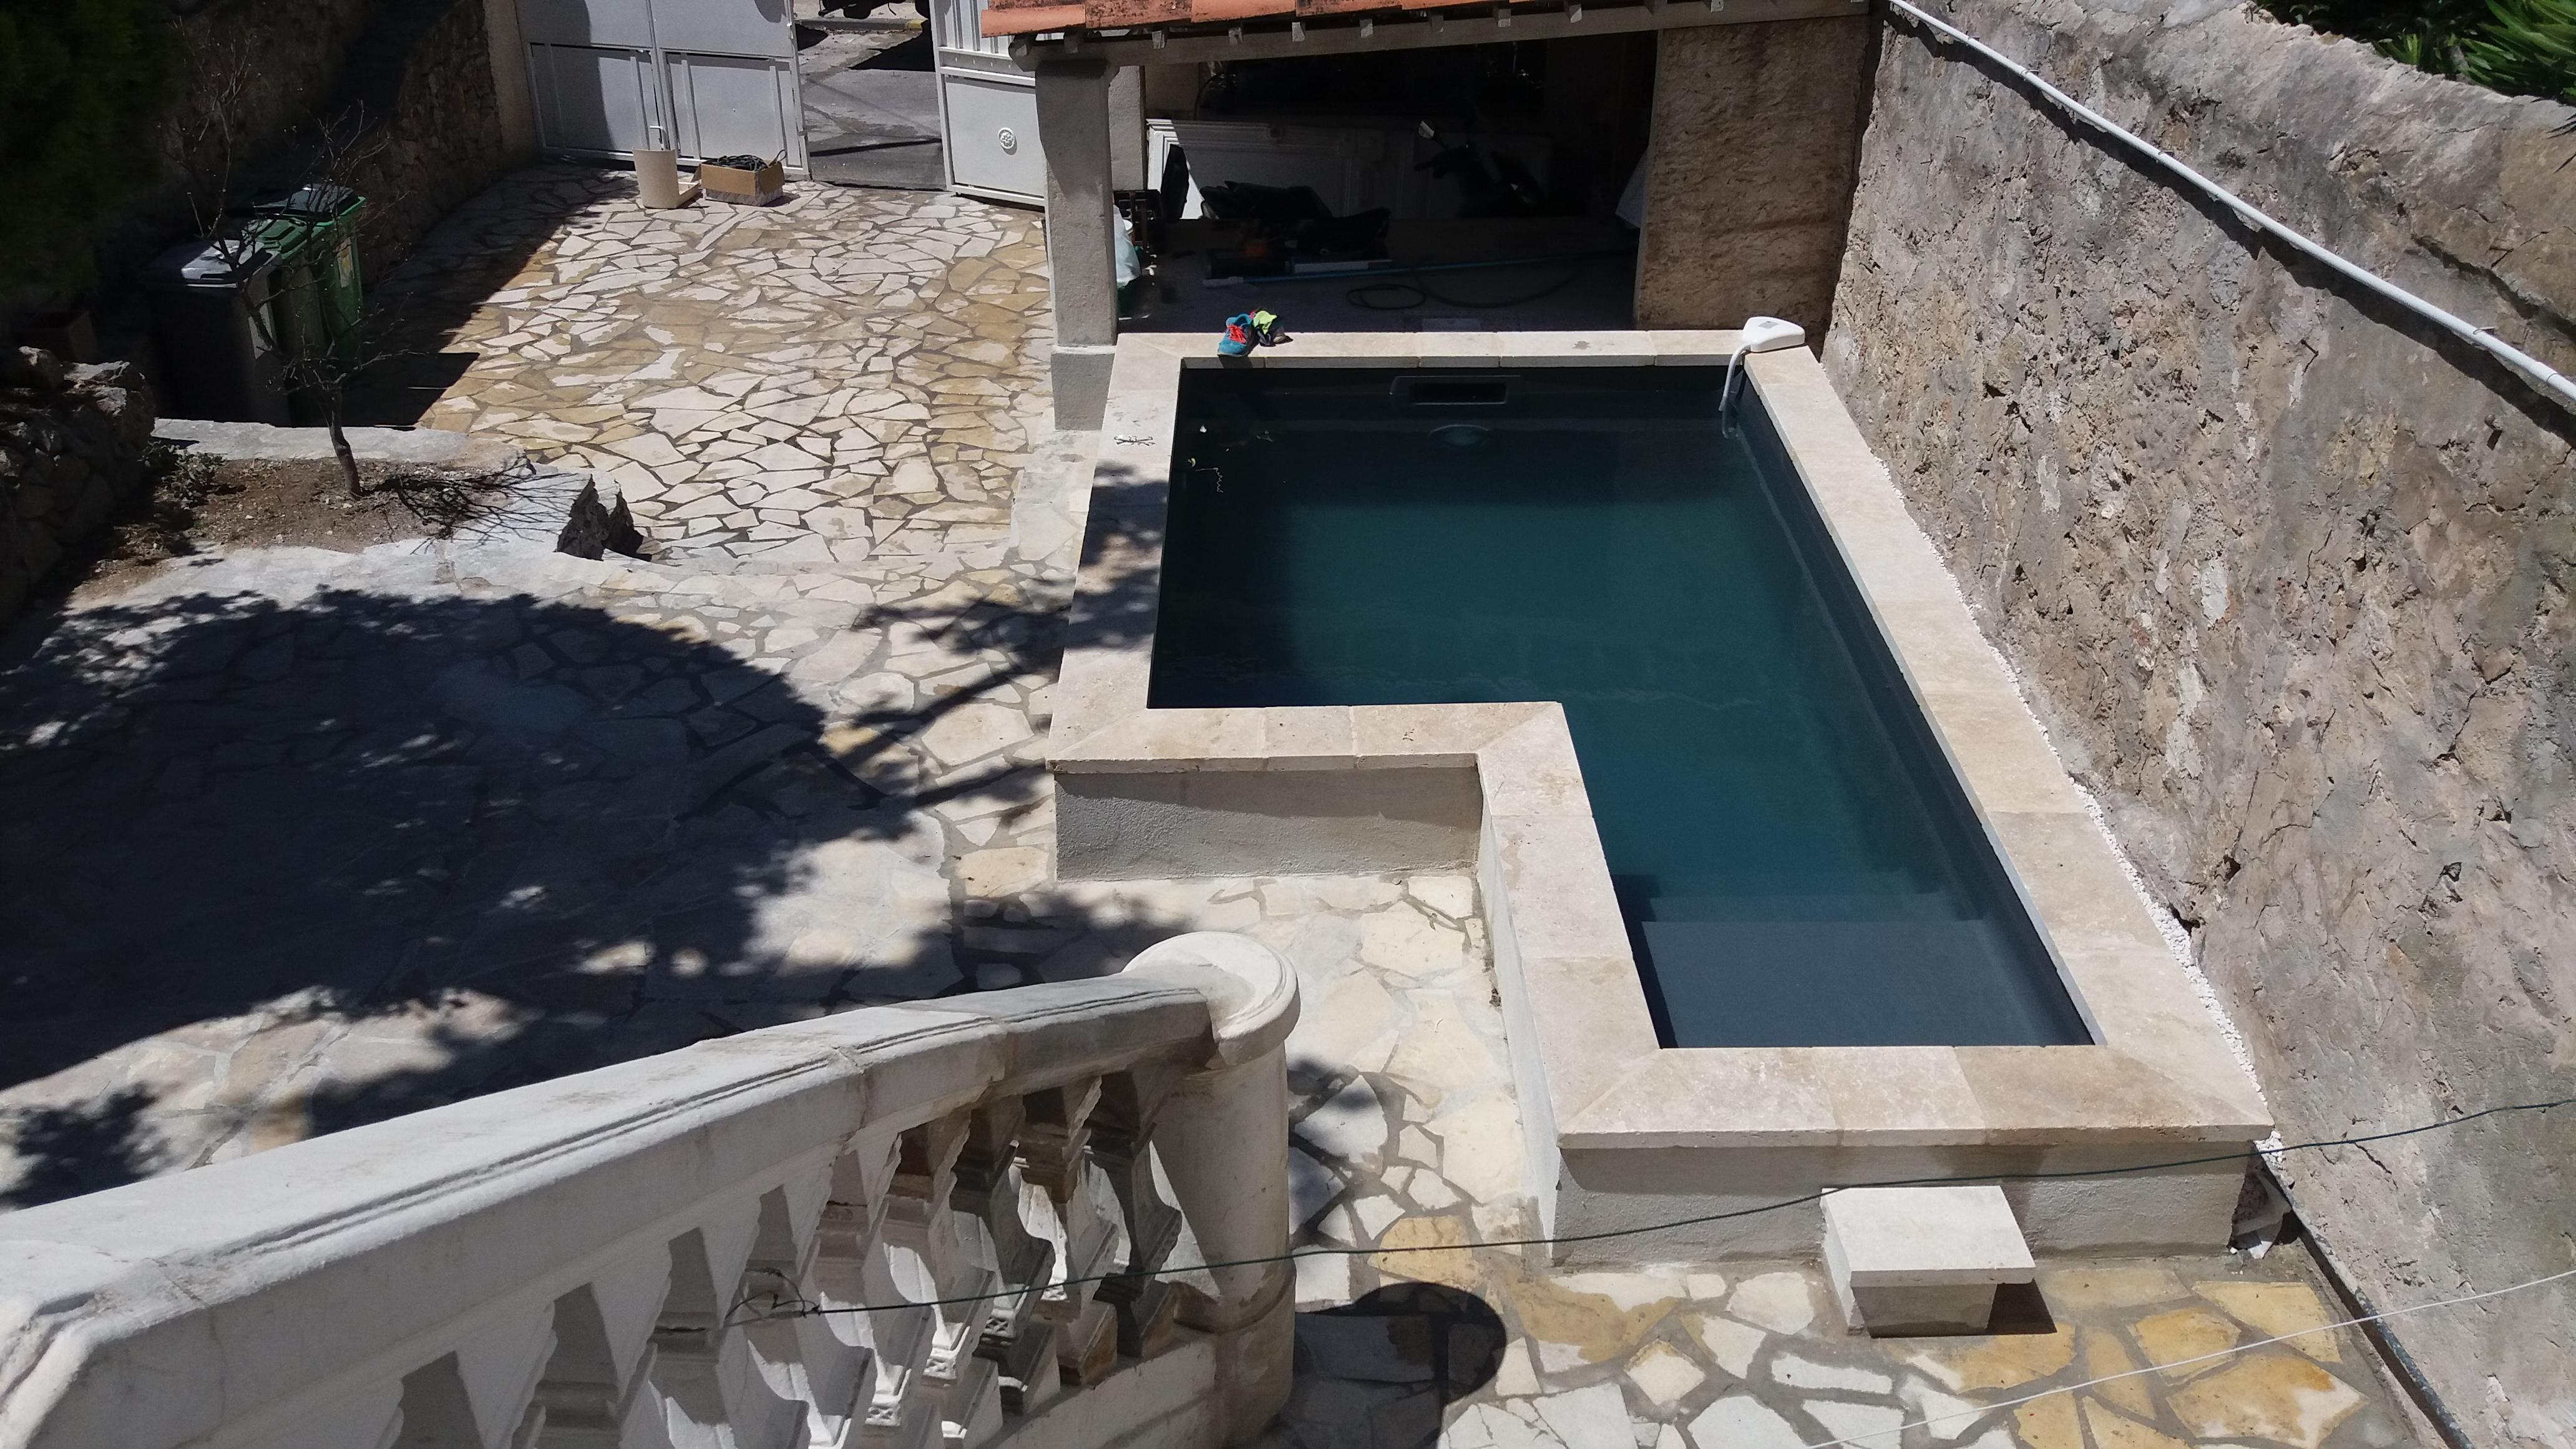 Construire piscine en ville jardin piscine et cabane - Piscine hors sol bricomarche ...